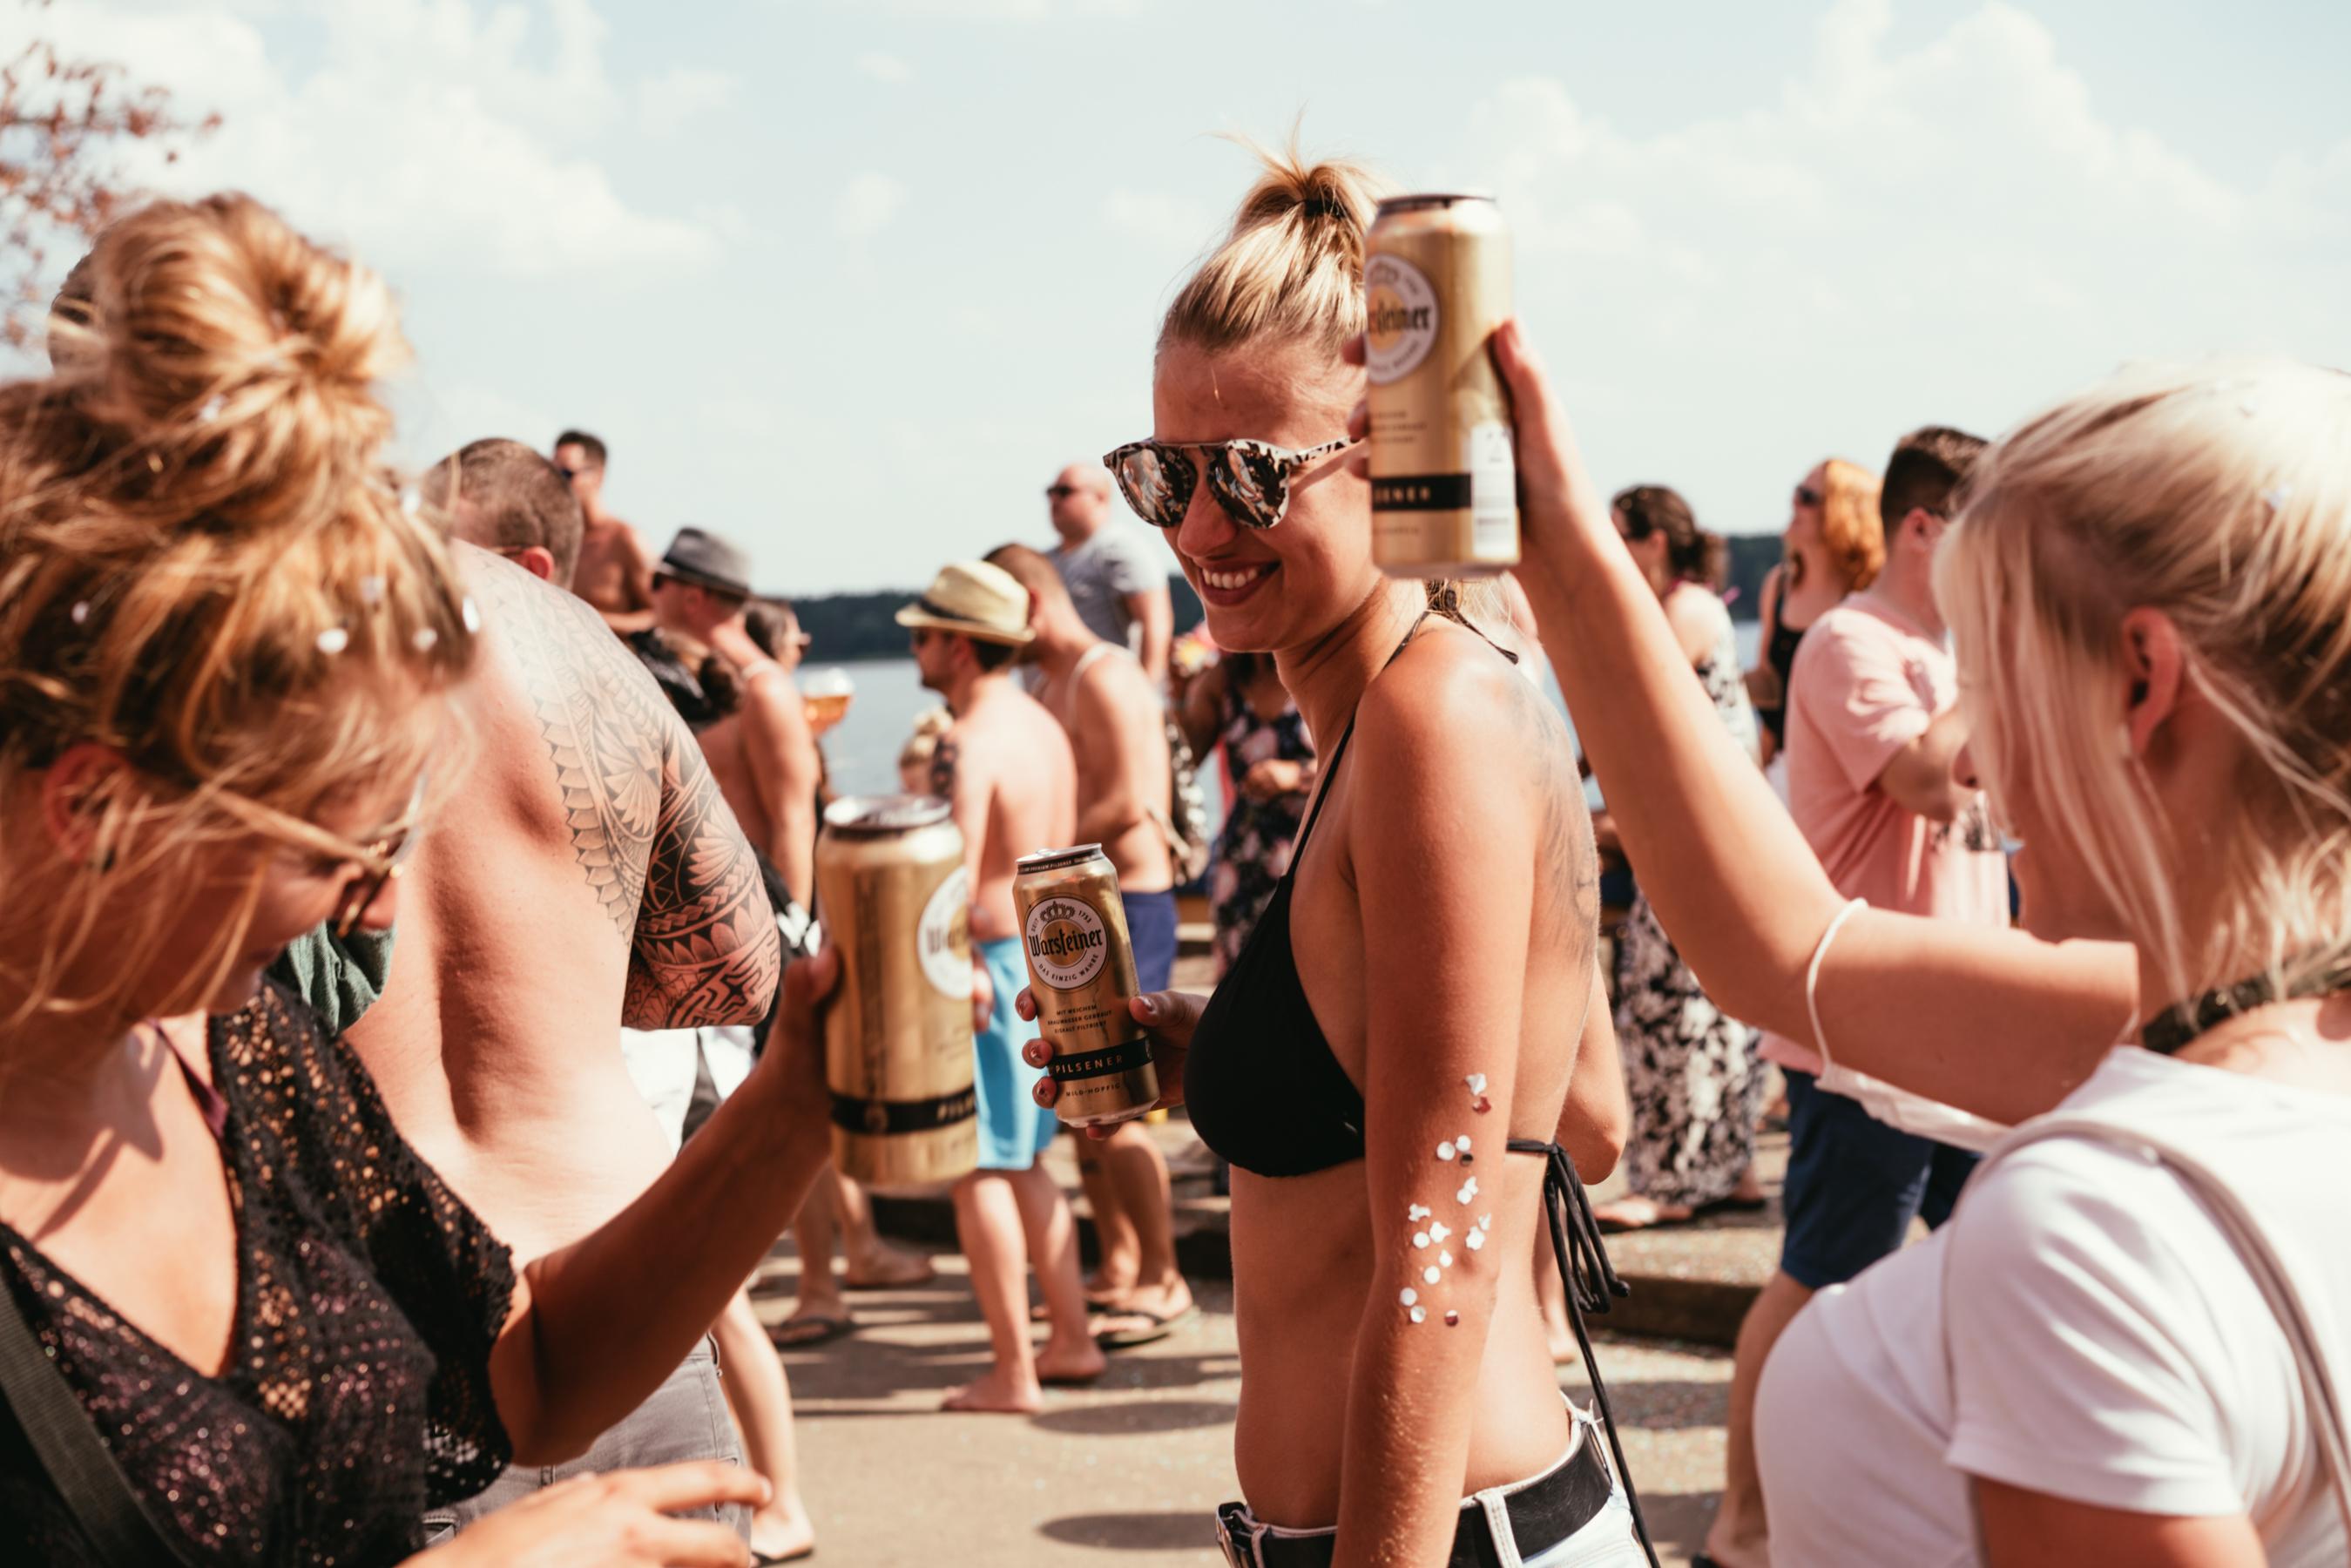 28-07-2018 Helene Beach Festival_Impressions-5